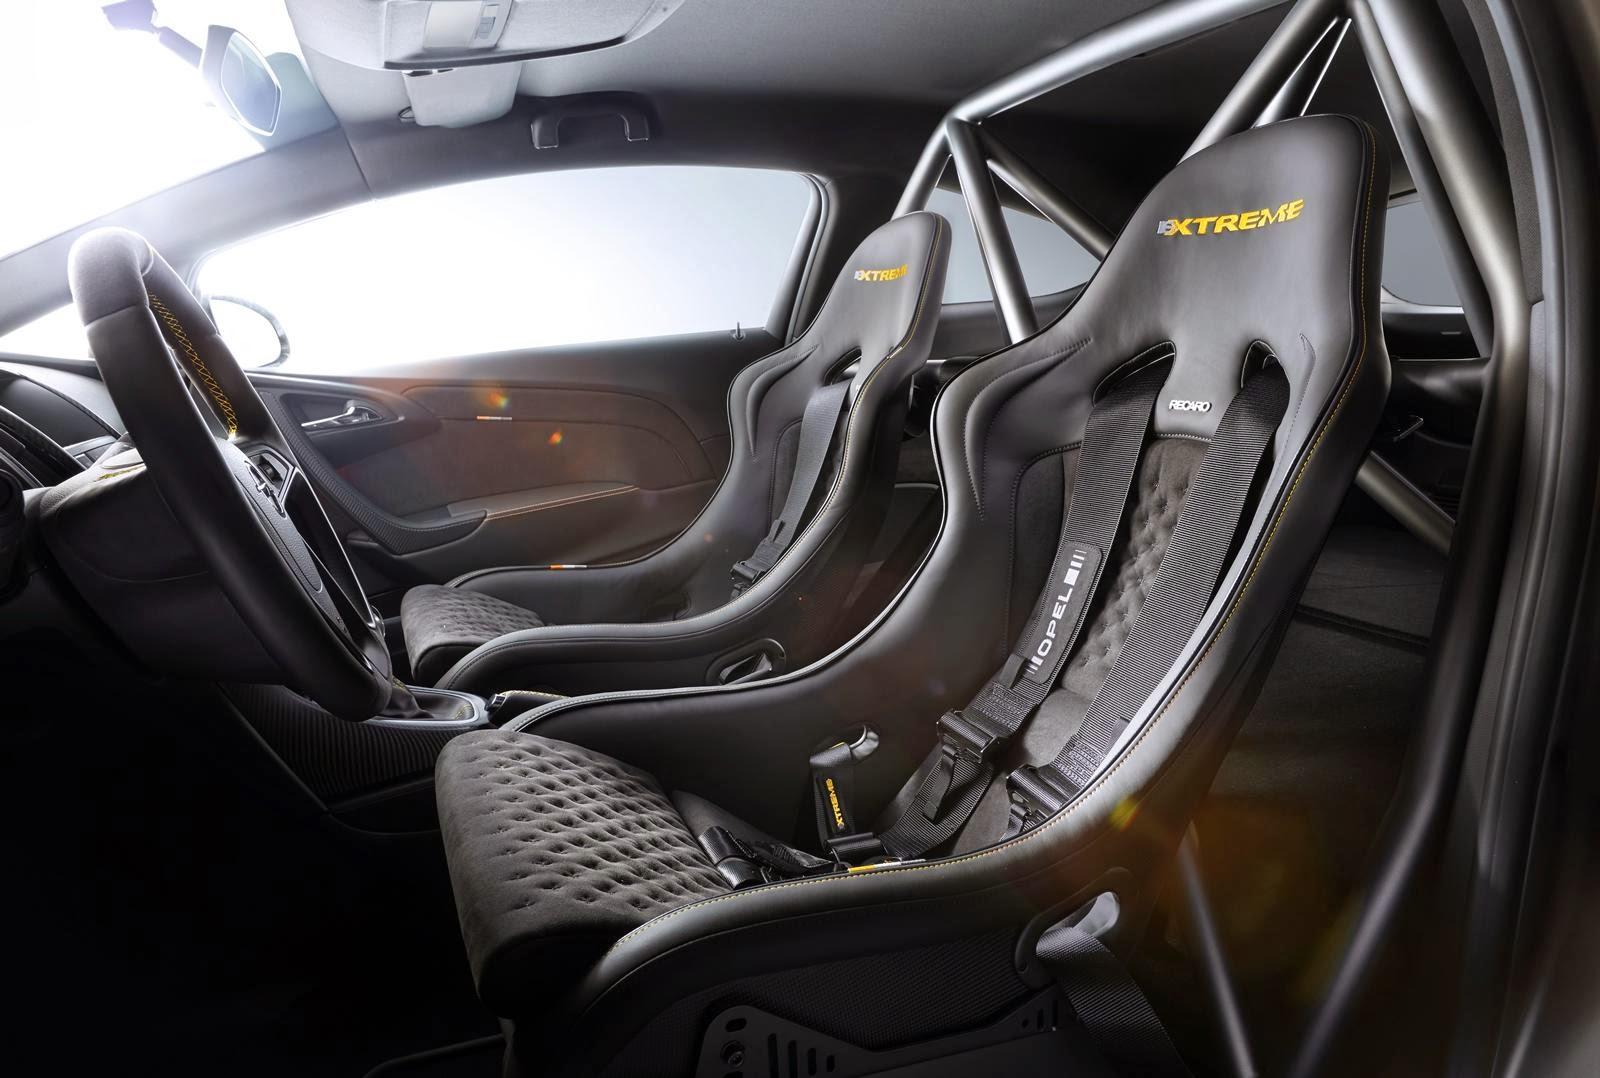 [Resim: Opel+Astra+OPC+EXTREME+3.jpg]